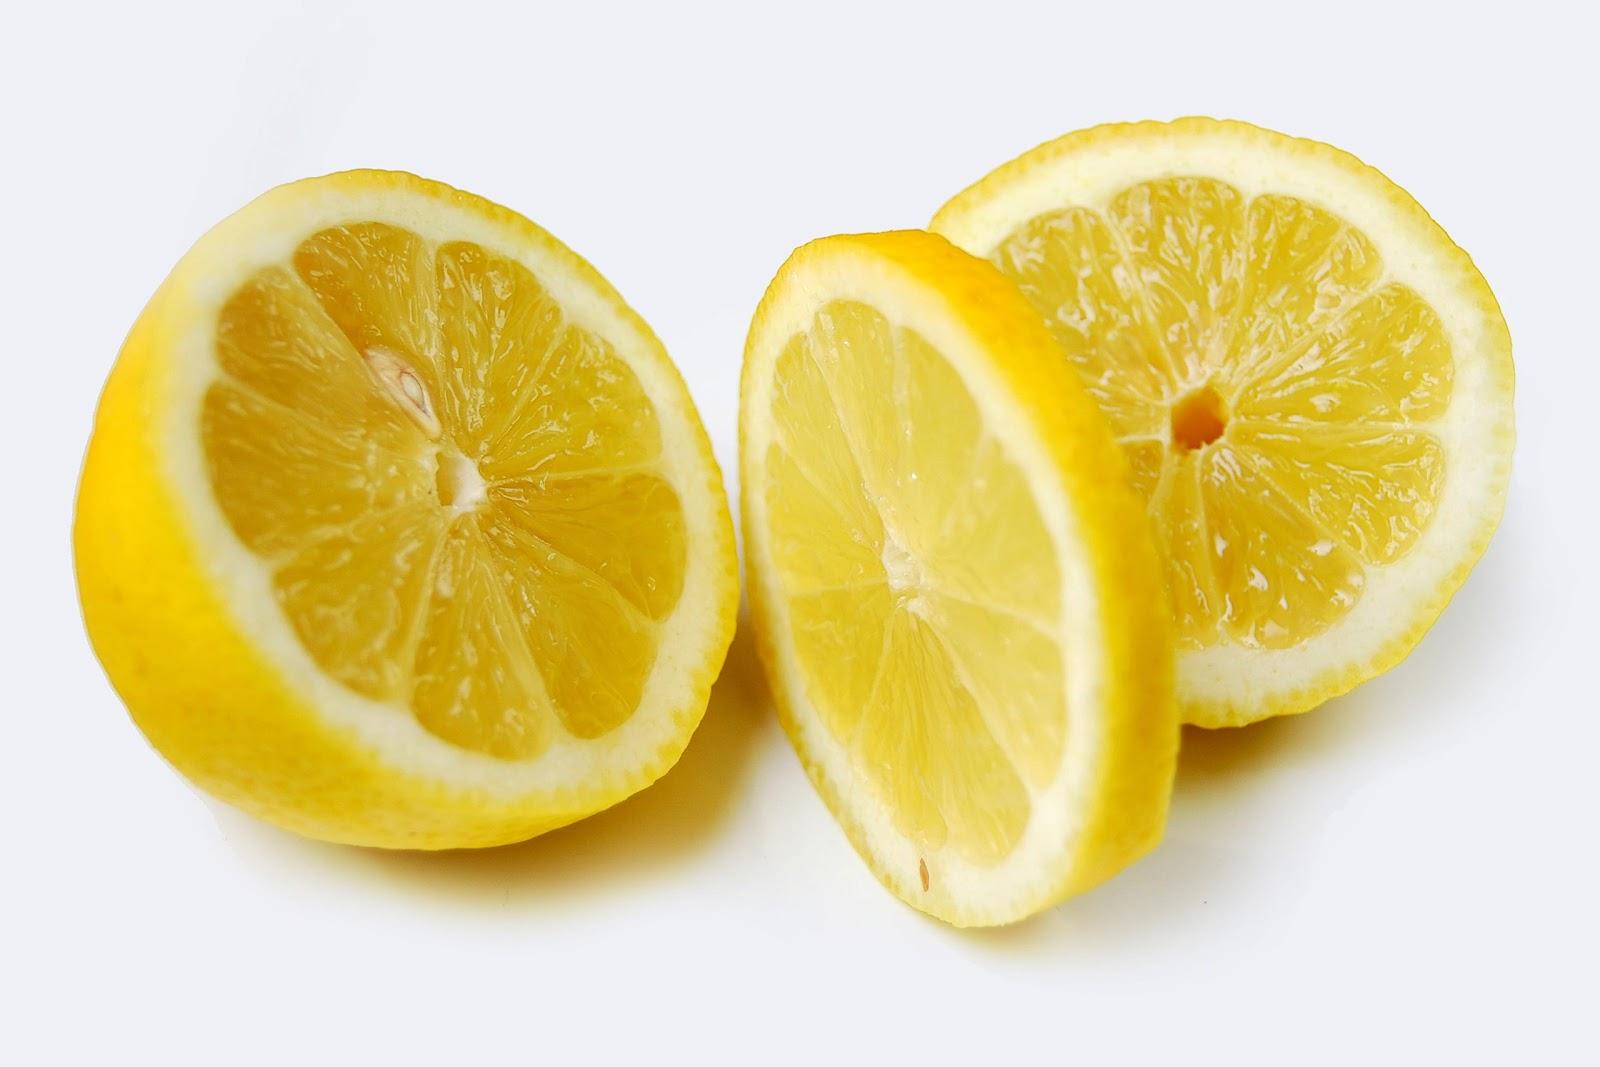 soñar con limones cortados